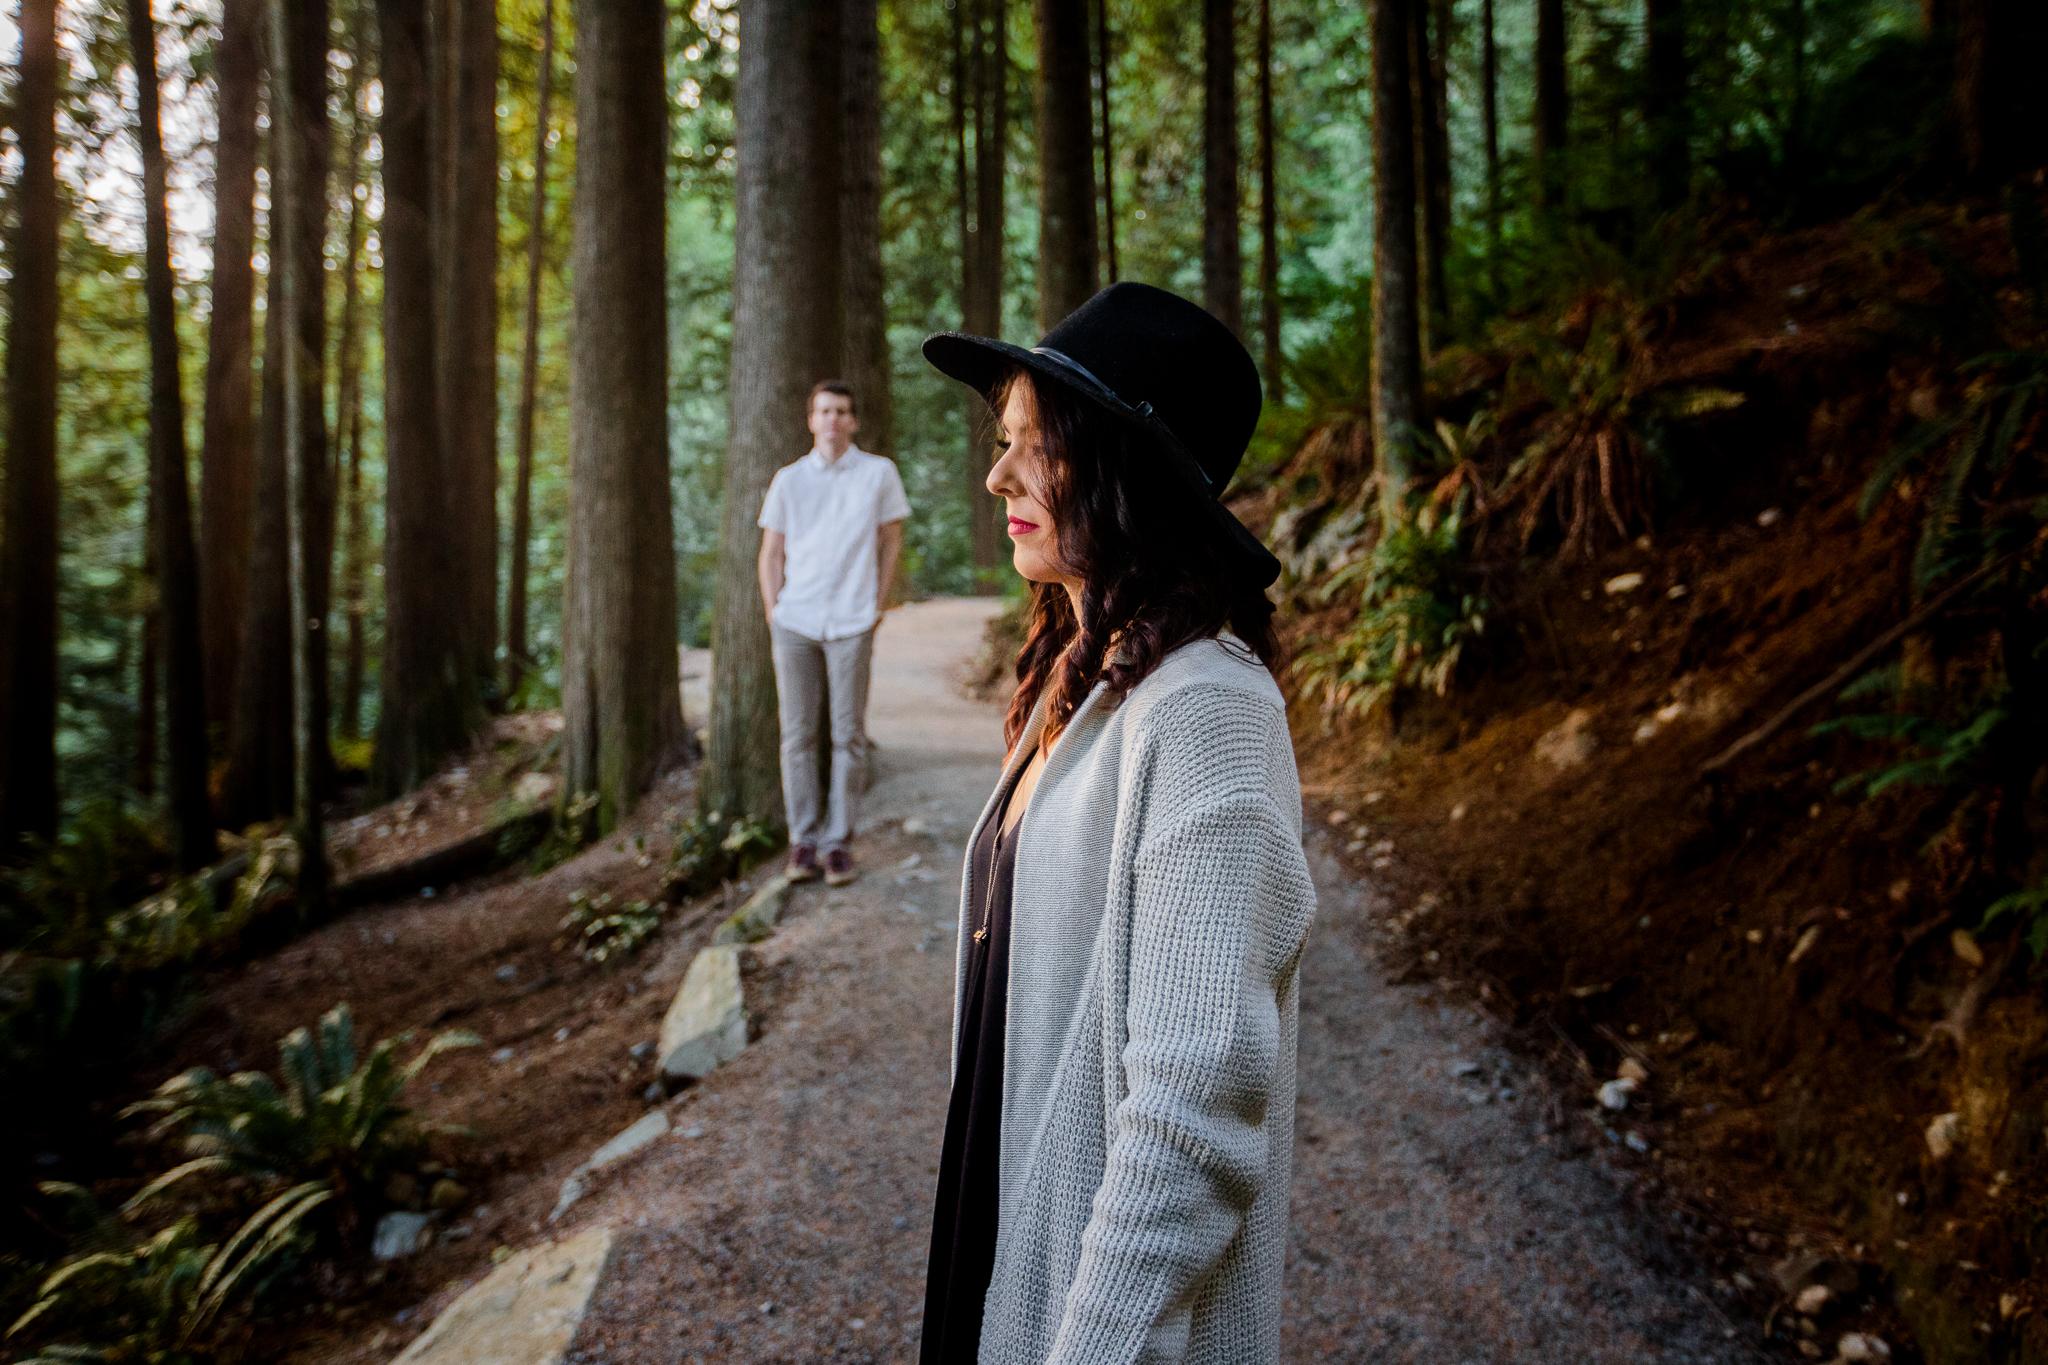 Photo of Buntzen Lake Anmore British Columbia Landscape Best Fun Engagement Photographer Port Moody Wedding Sunset Romantic Couple Photos 045.jpg